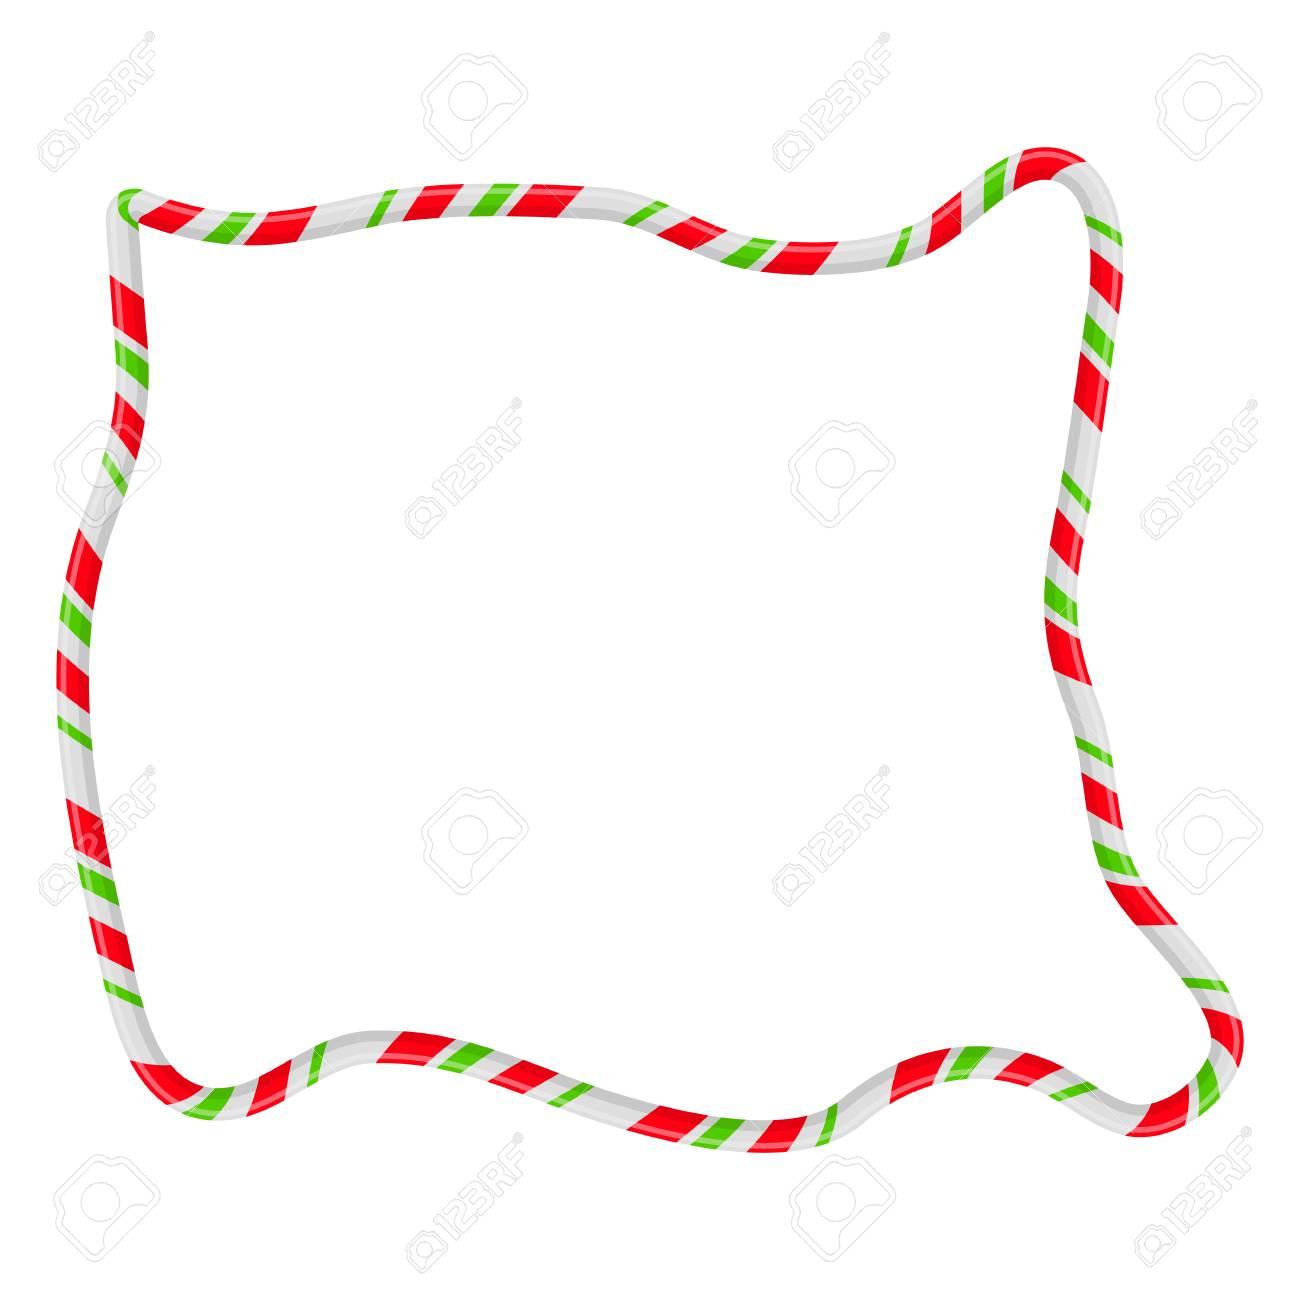 hight resolution of candy cane frame border random shape vector christmas design isolated on white background stock vector